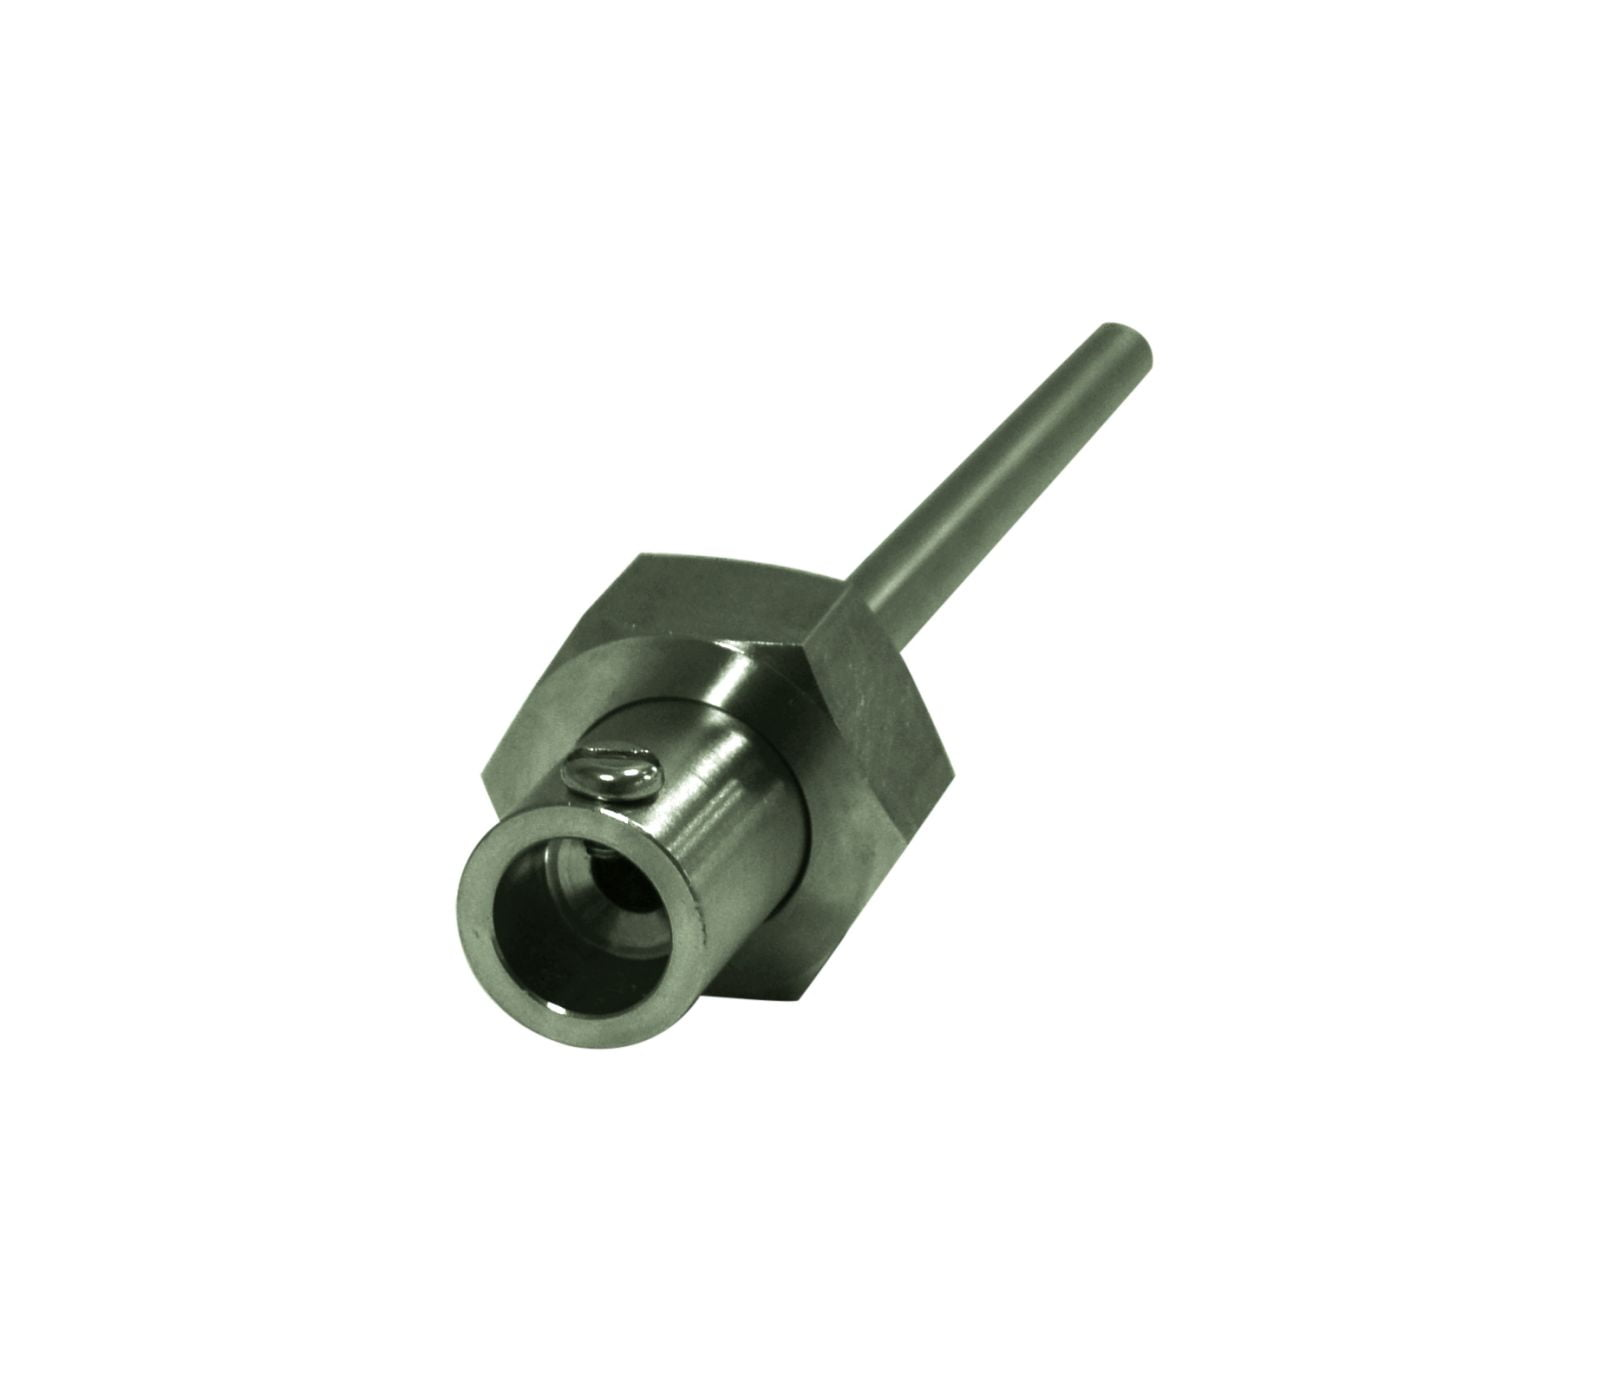 гильза резьбовая SPEIDEL NW 10 для термометра / термодатчика FermFlex _2